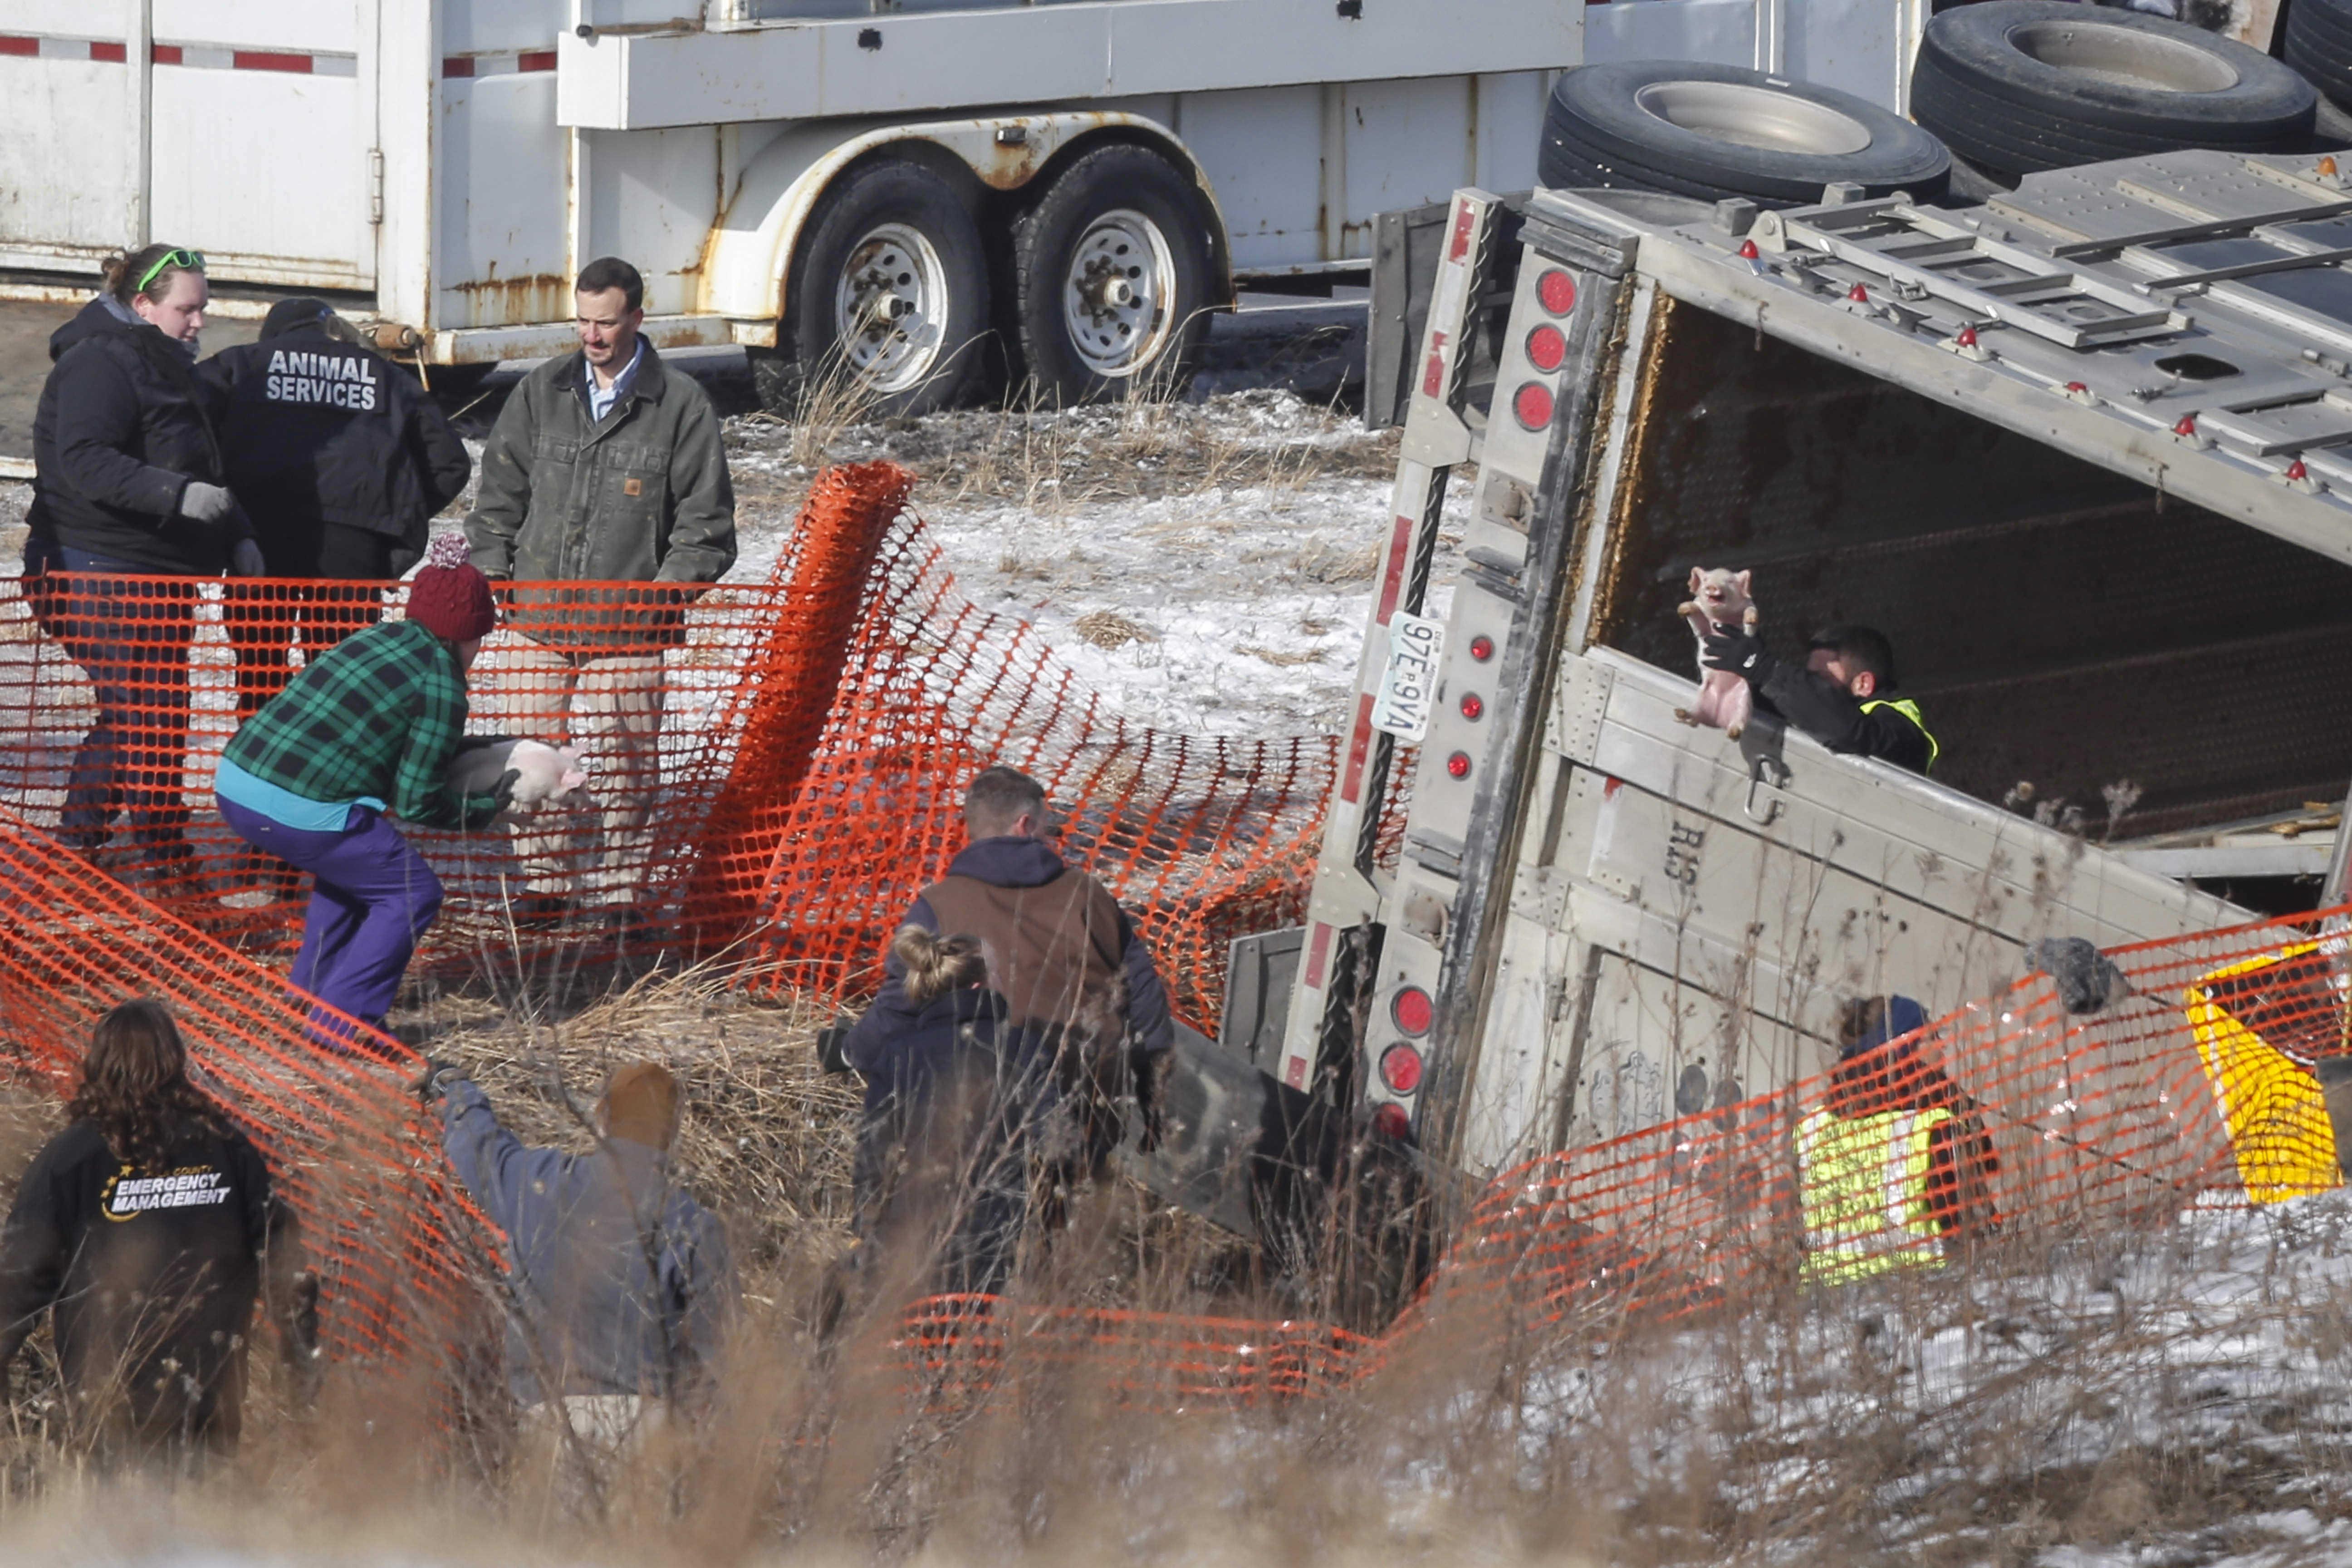 Over 100 Piglets Die During Livestock Semi-Trailer Crash in Iowa